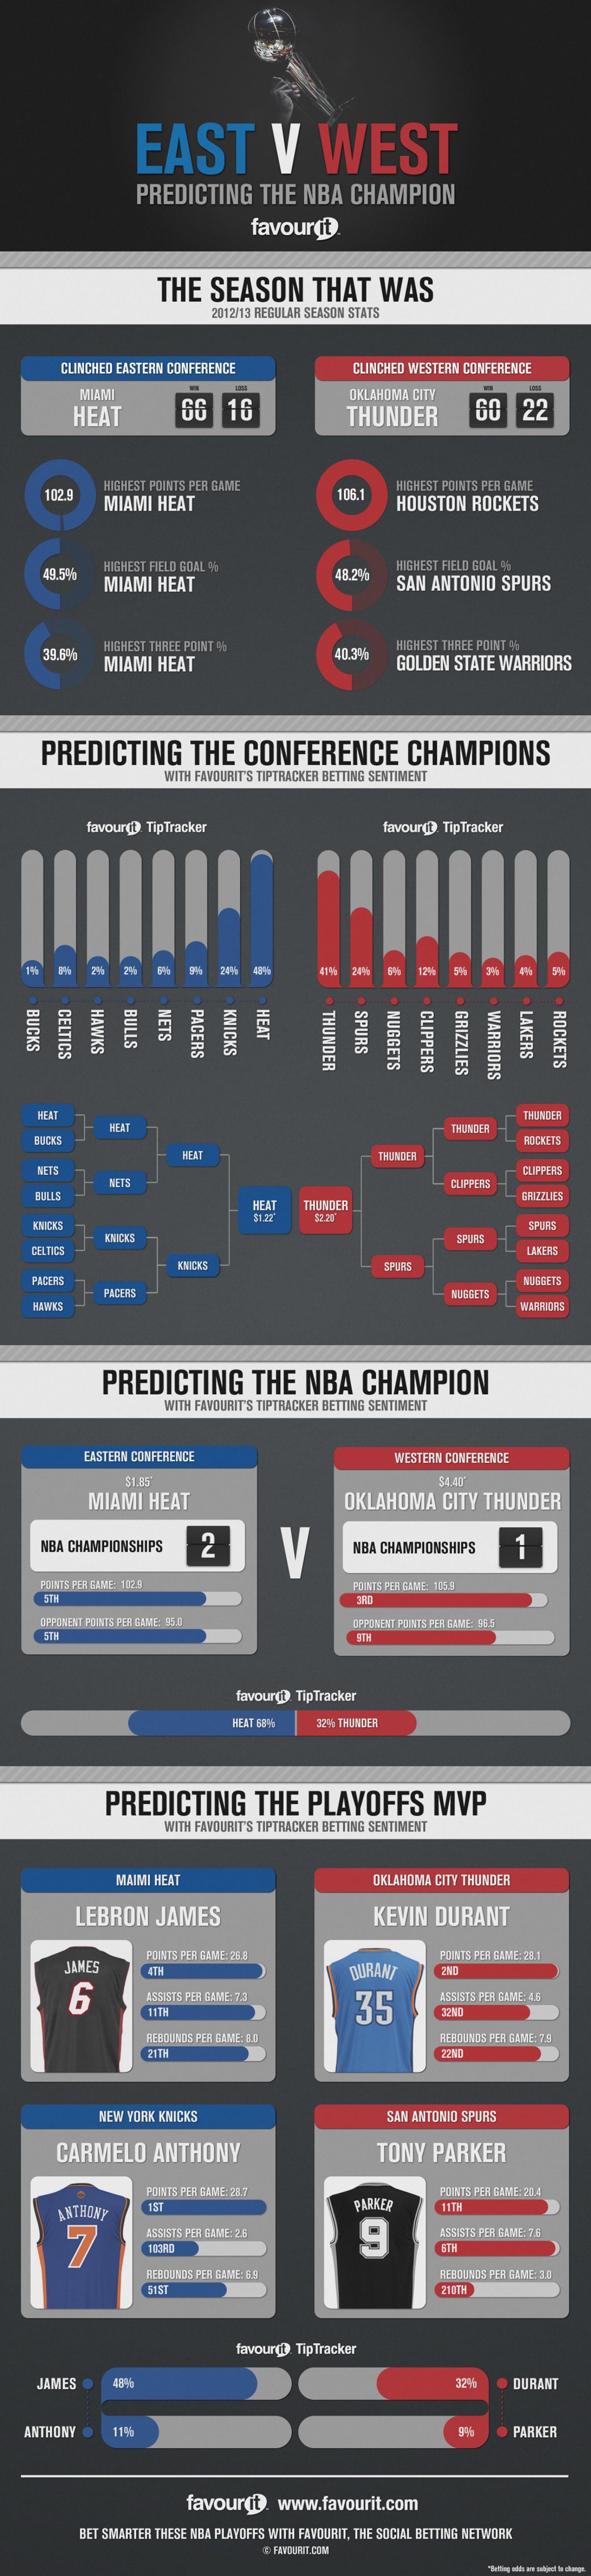 Predicting the NBA Champion